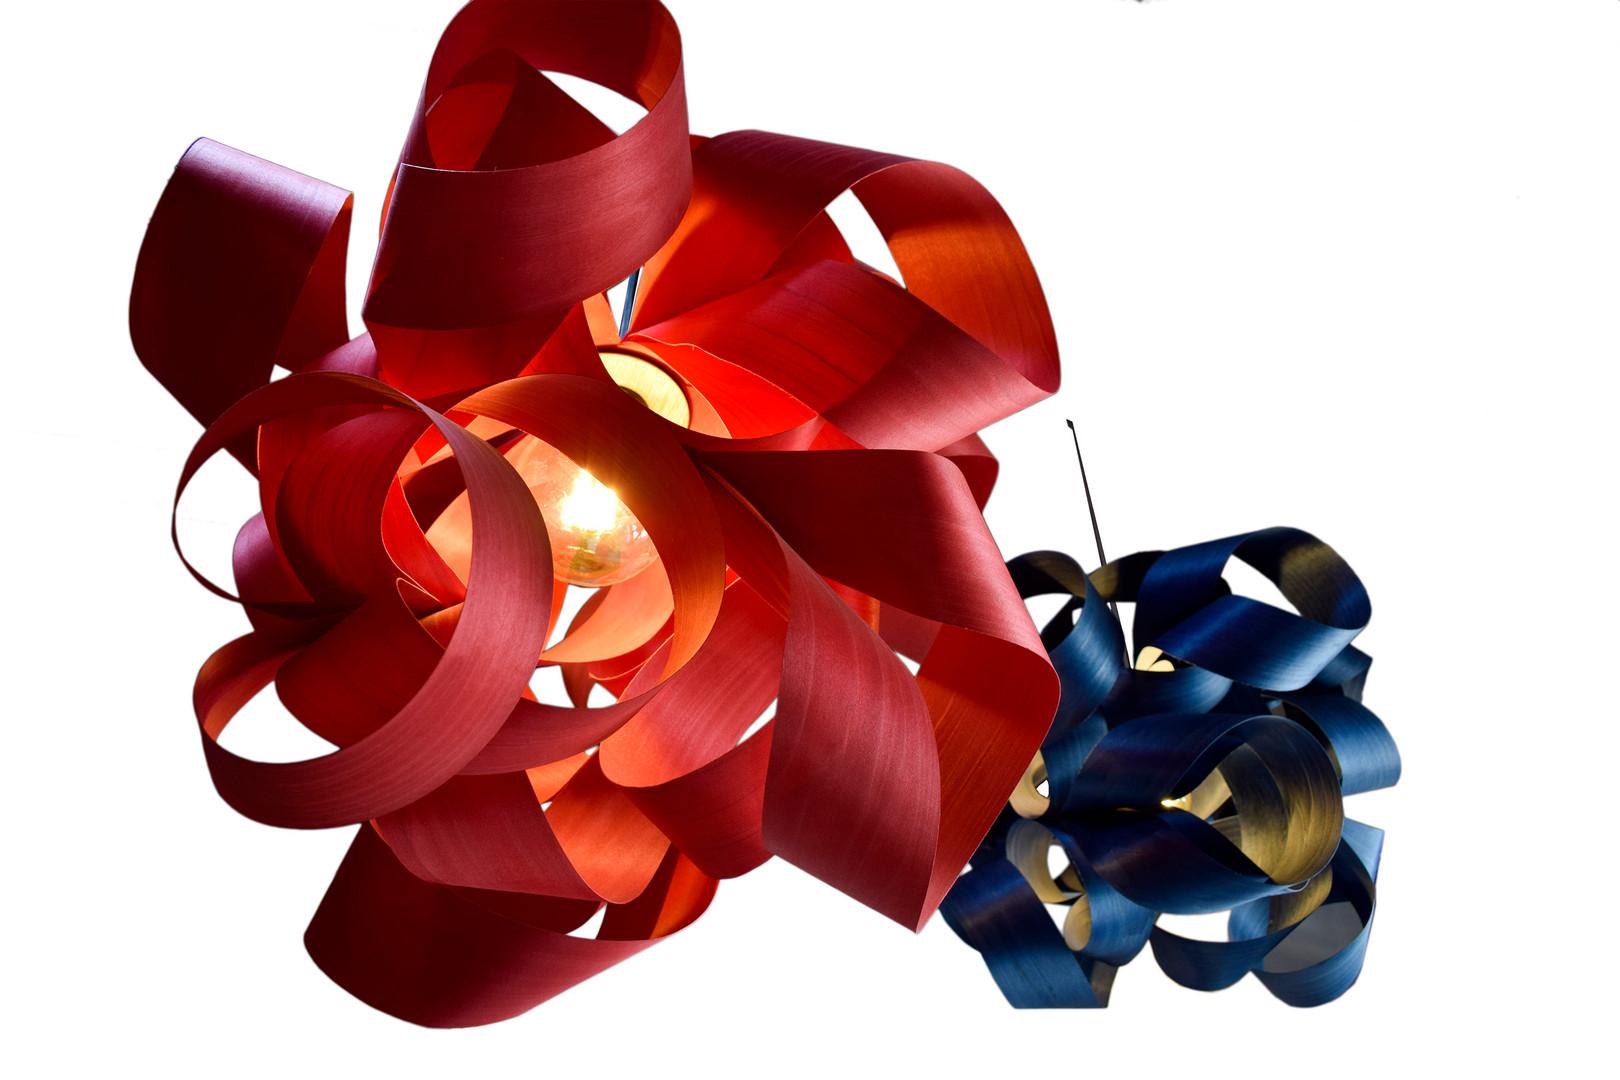 La Bellota Nidos roja azul.jpg